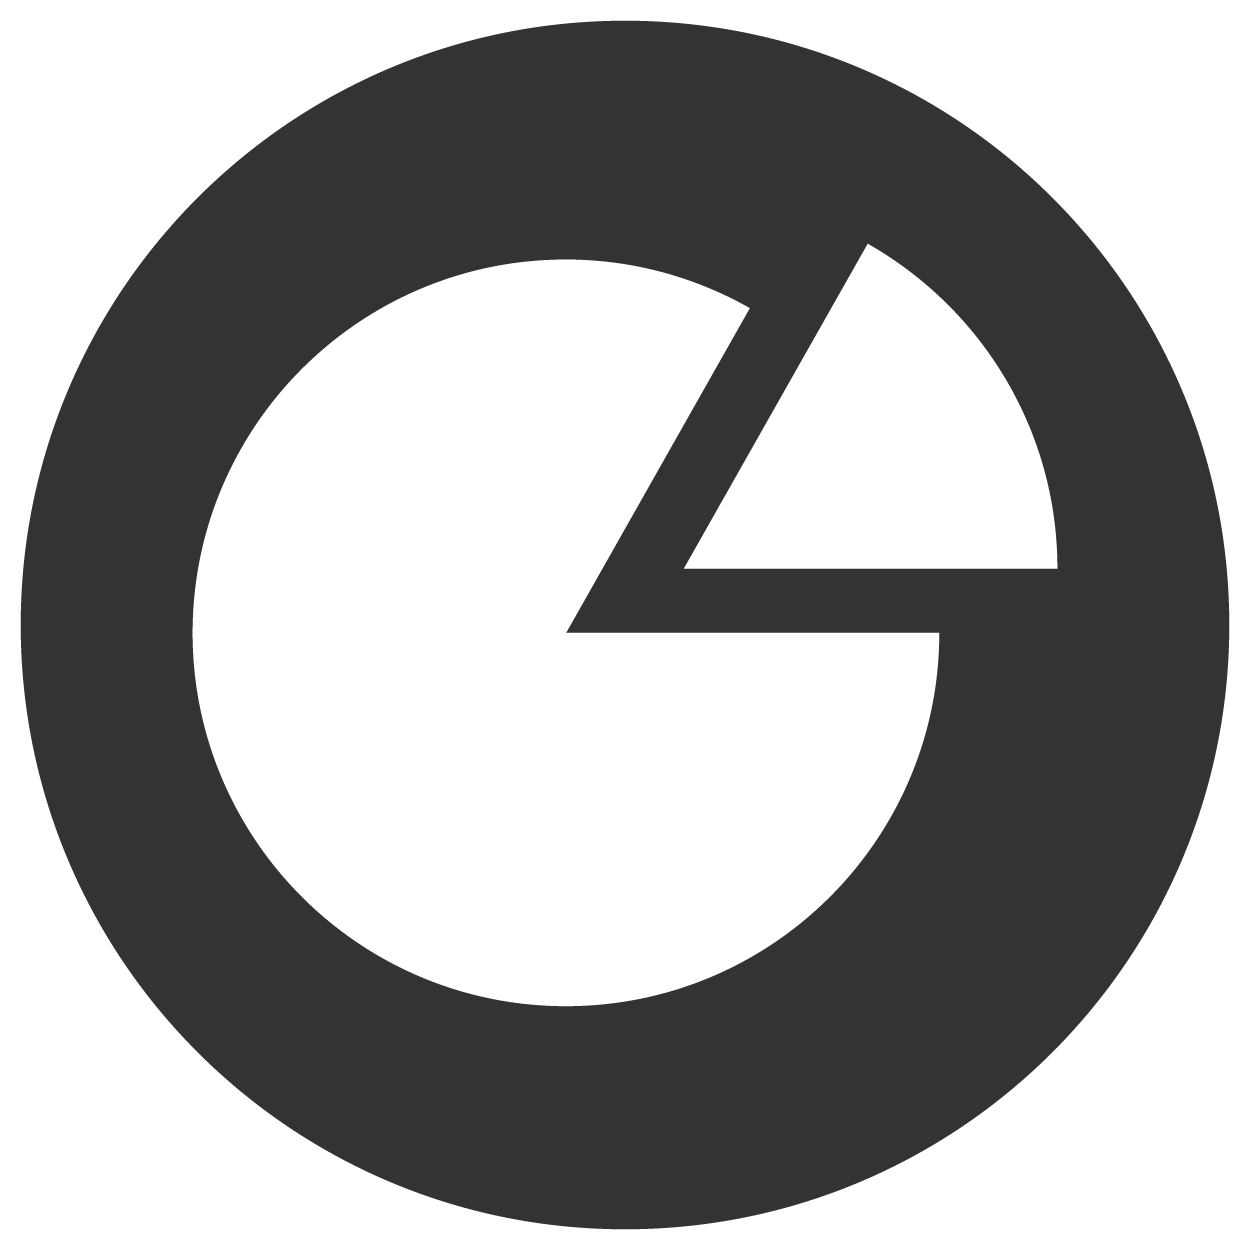 DanKam_IconSet-04.png